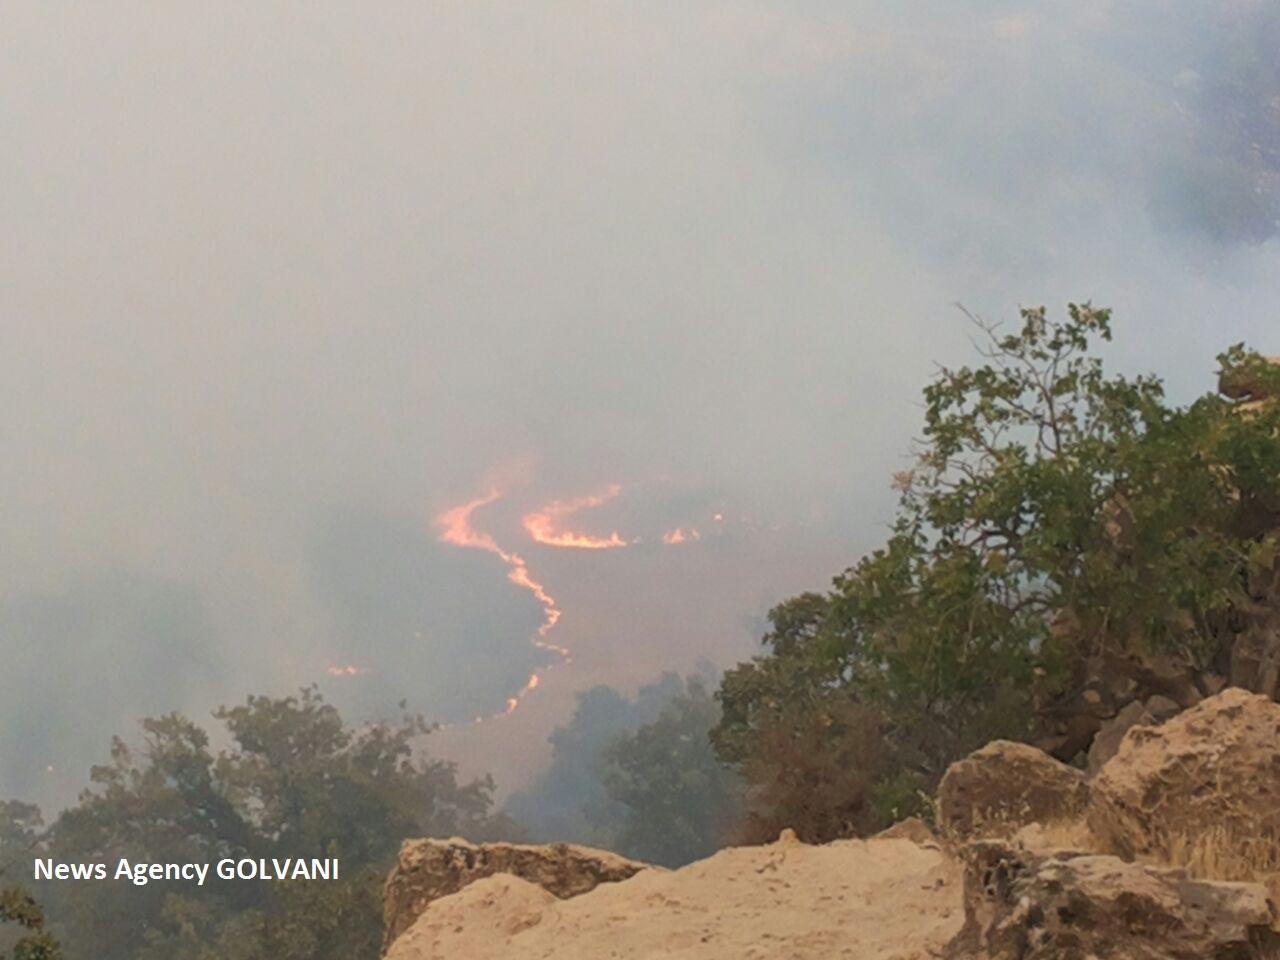 آتشسوزی در کیالوی لُرستان عمدی بود/ تصاویر اختصاصی